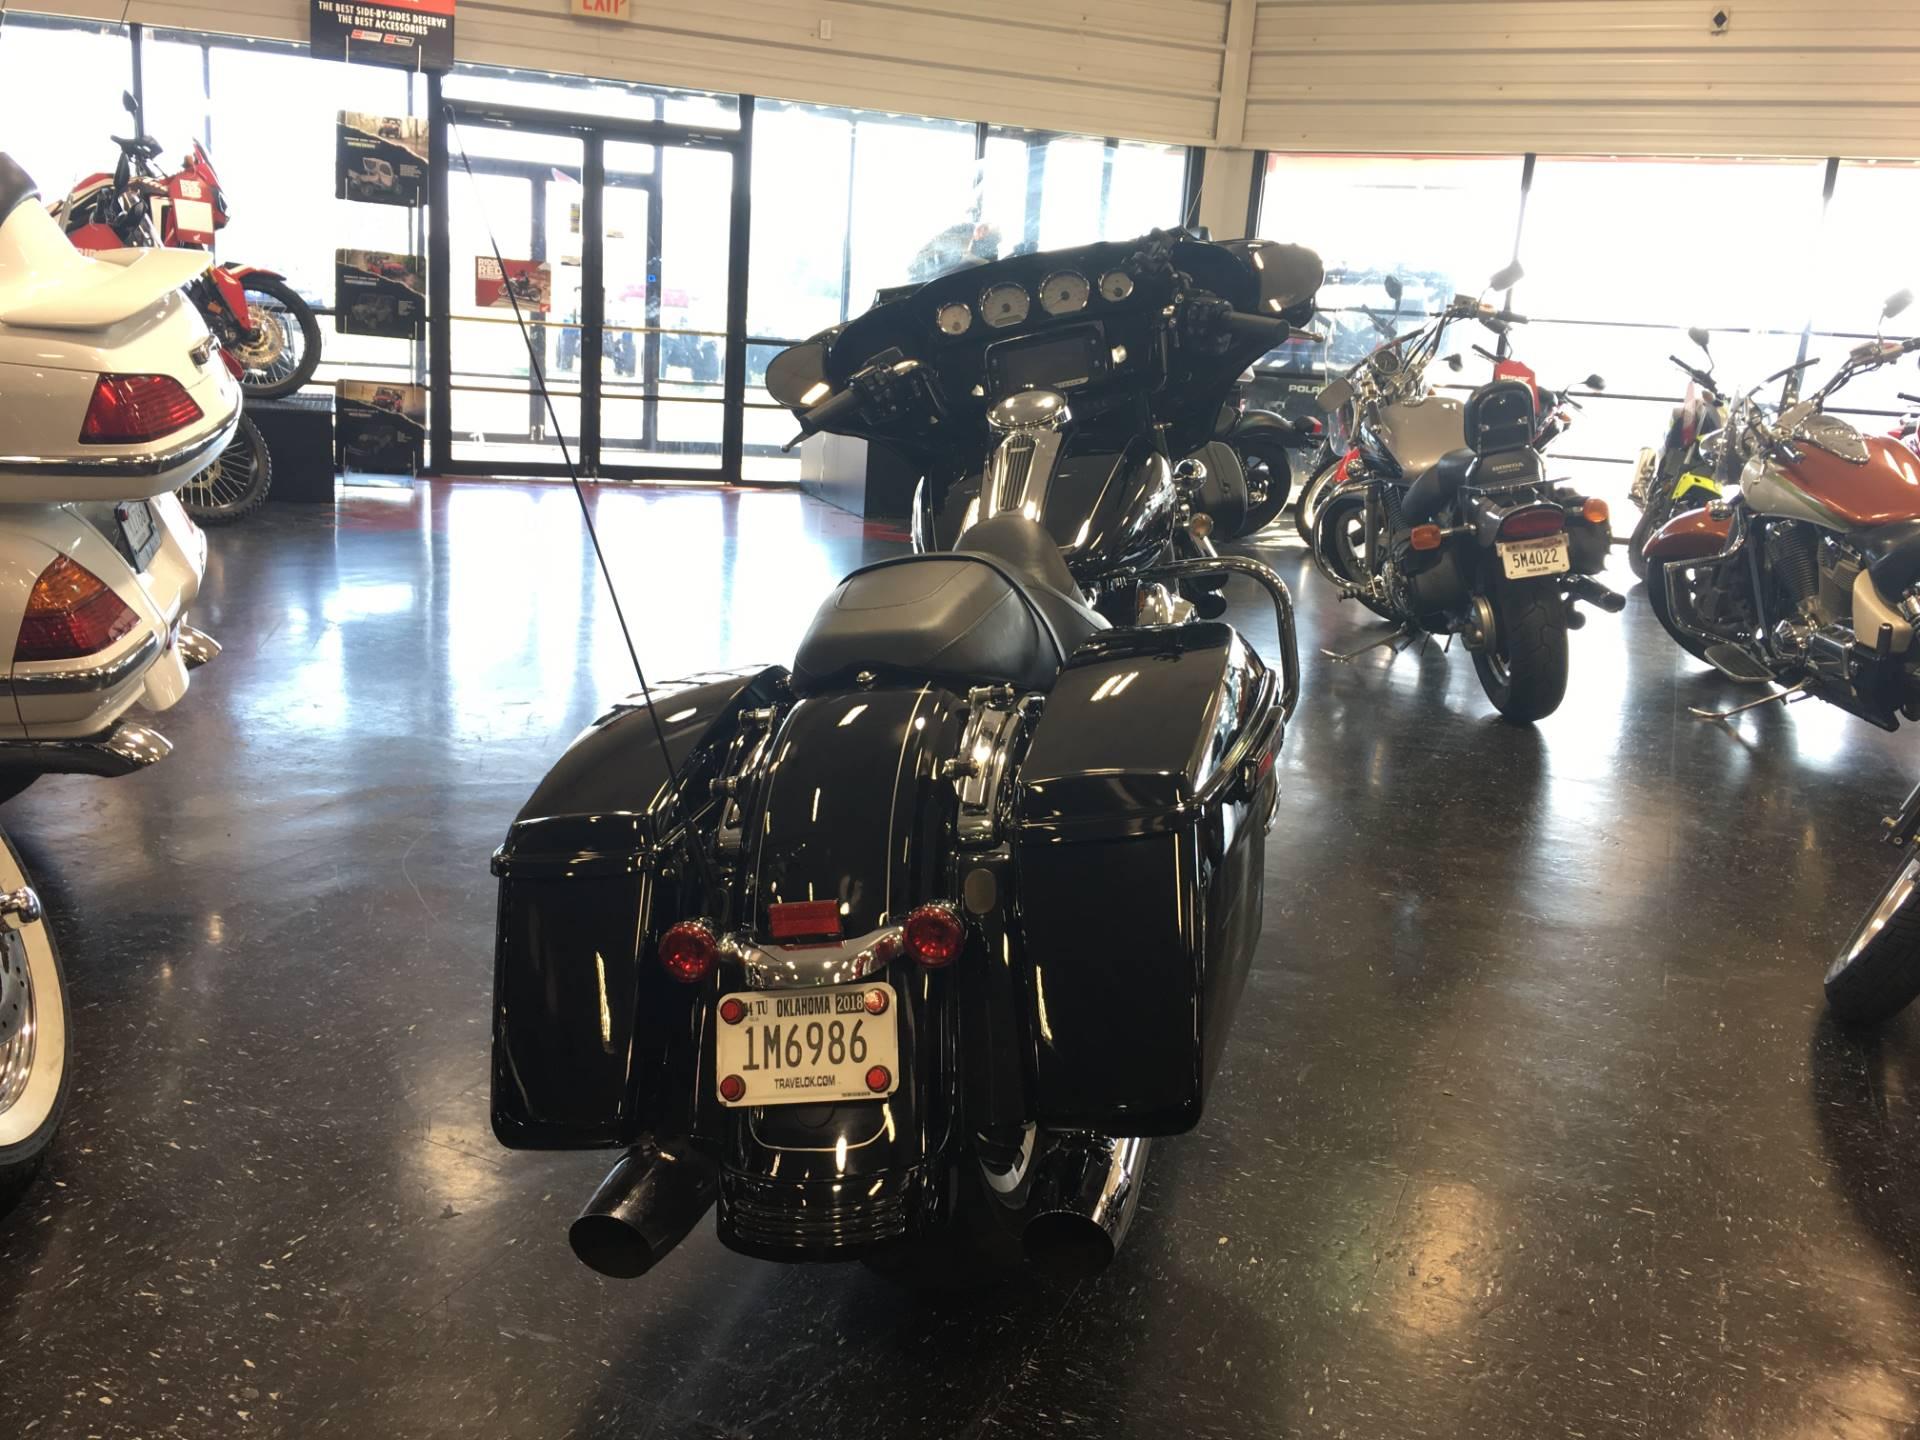 2016 Harley-Davidson Street Glide Special 2